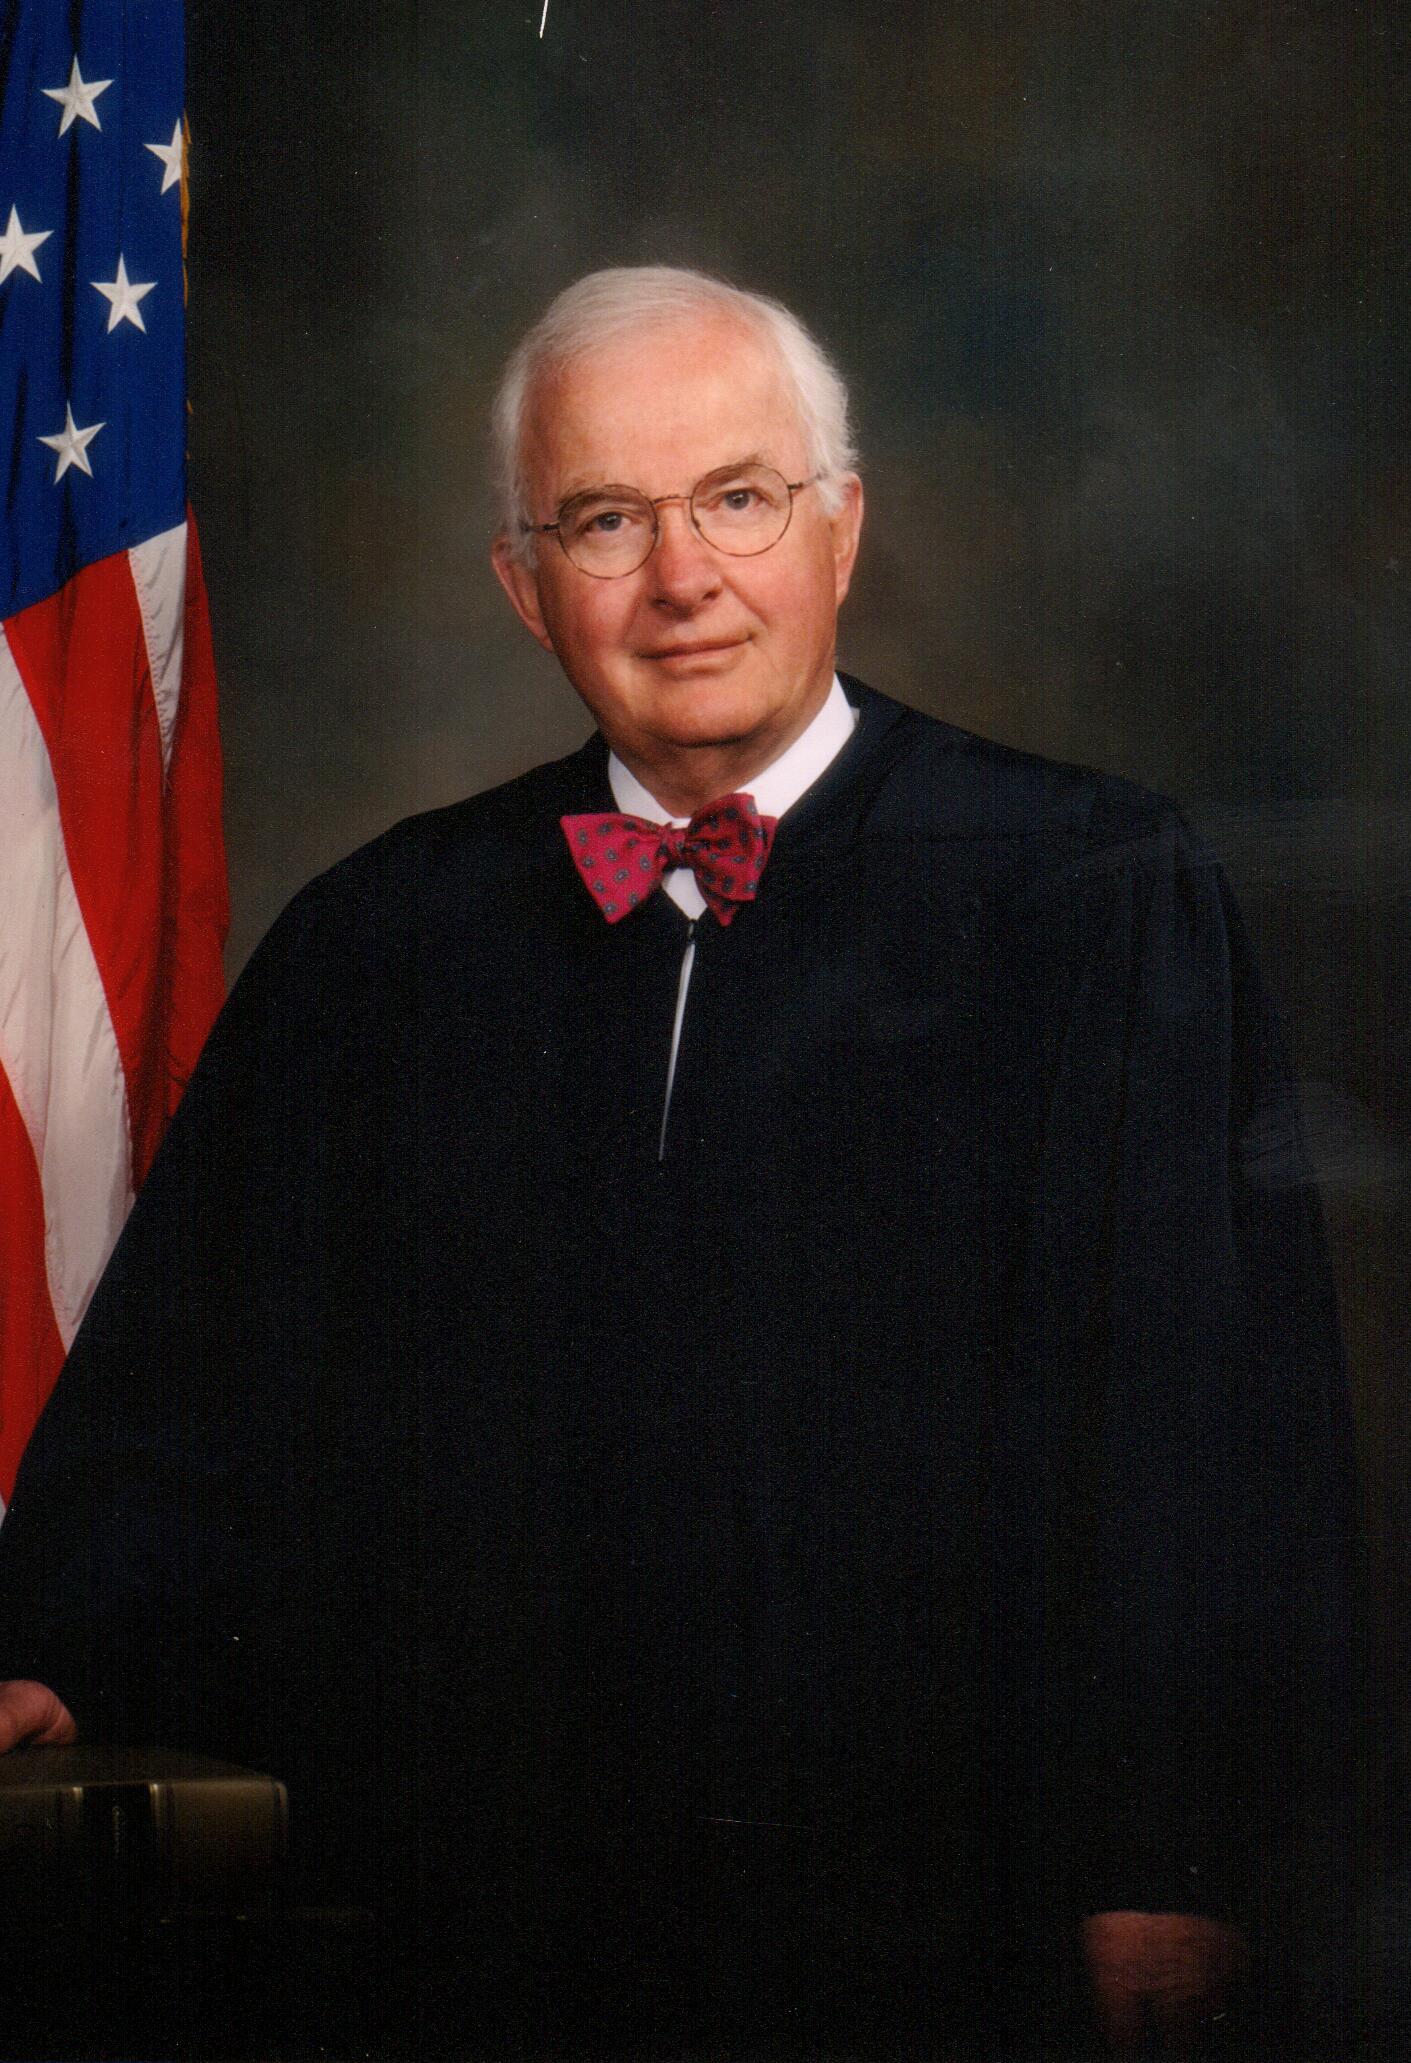 Judge Richard Howard Battey